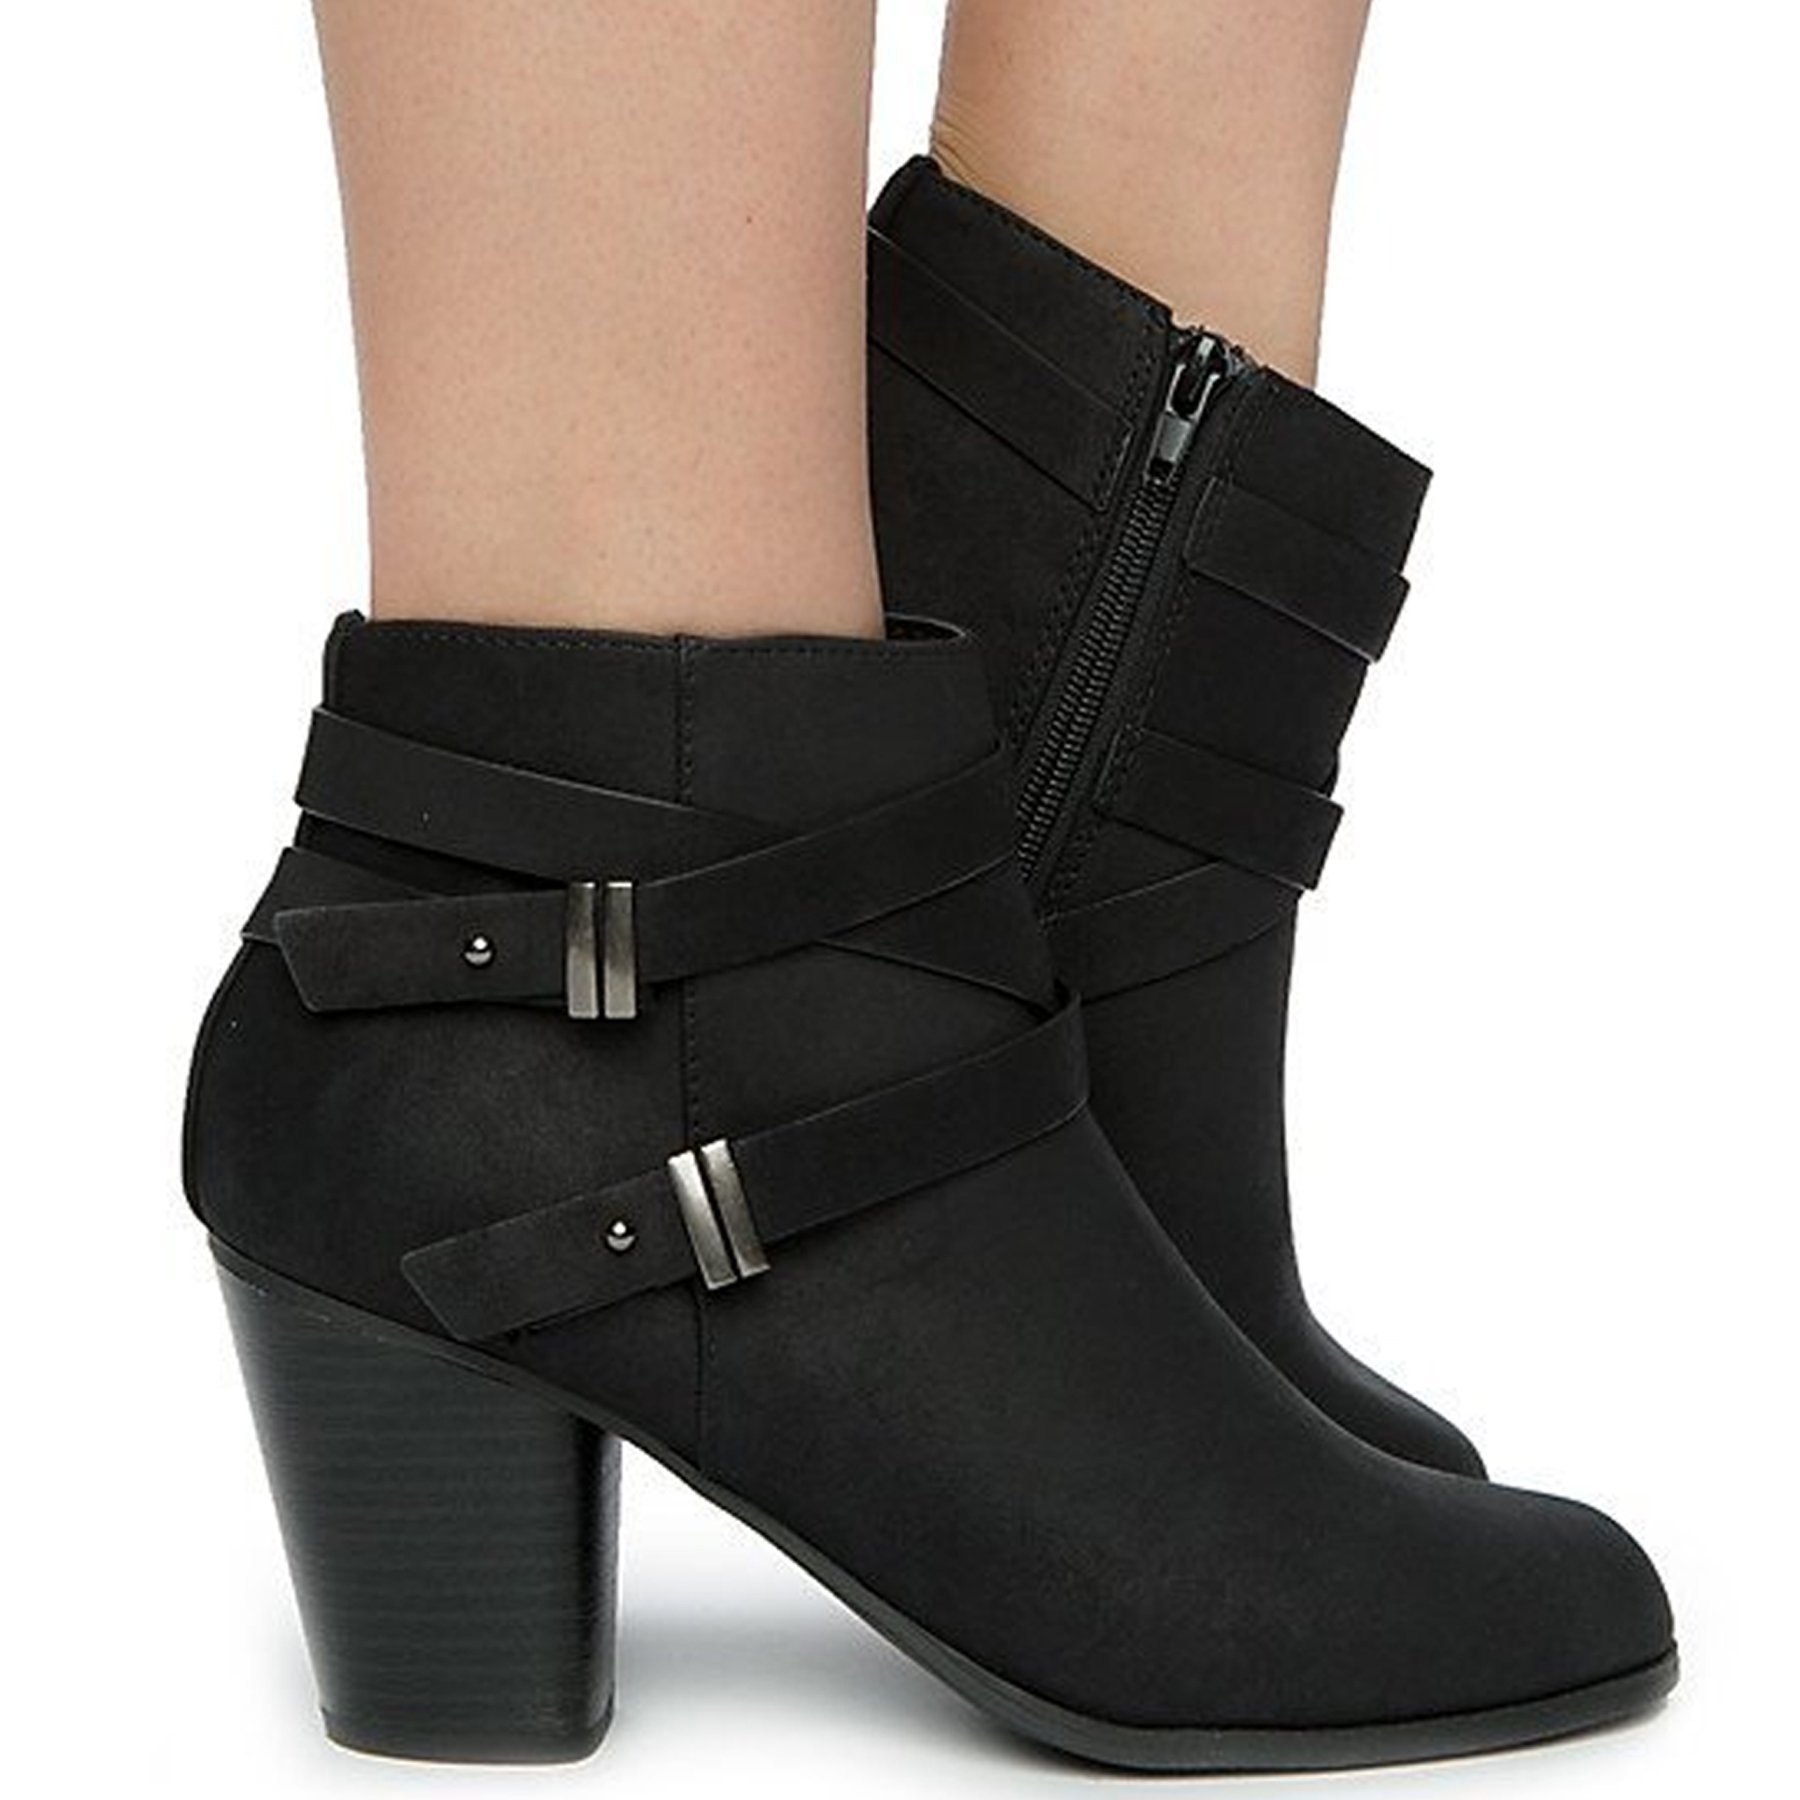 Soda Alum Womens Stylish Buckle Strap Dress Ankle Bootie (9 B(M) US, Black Nubuck)